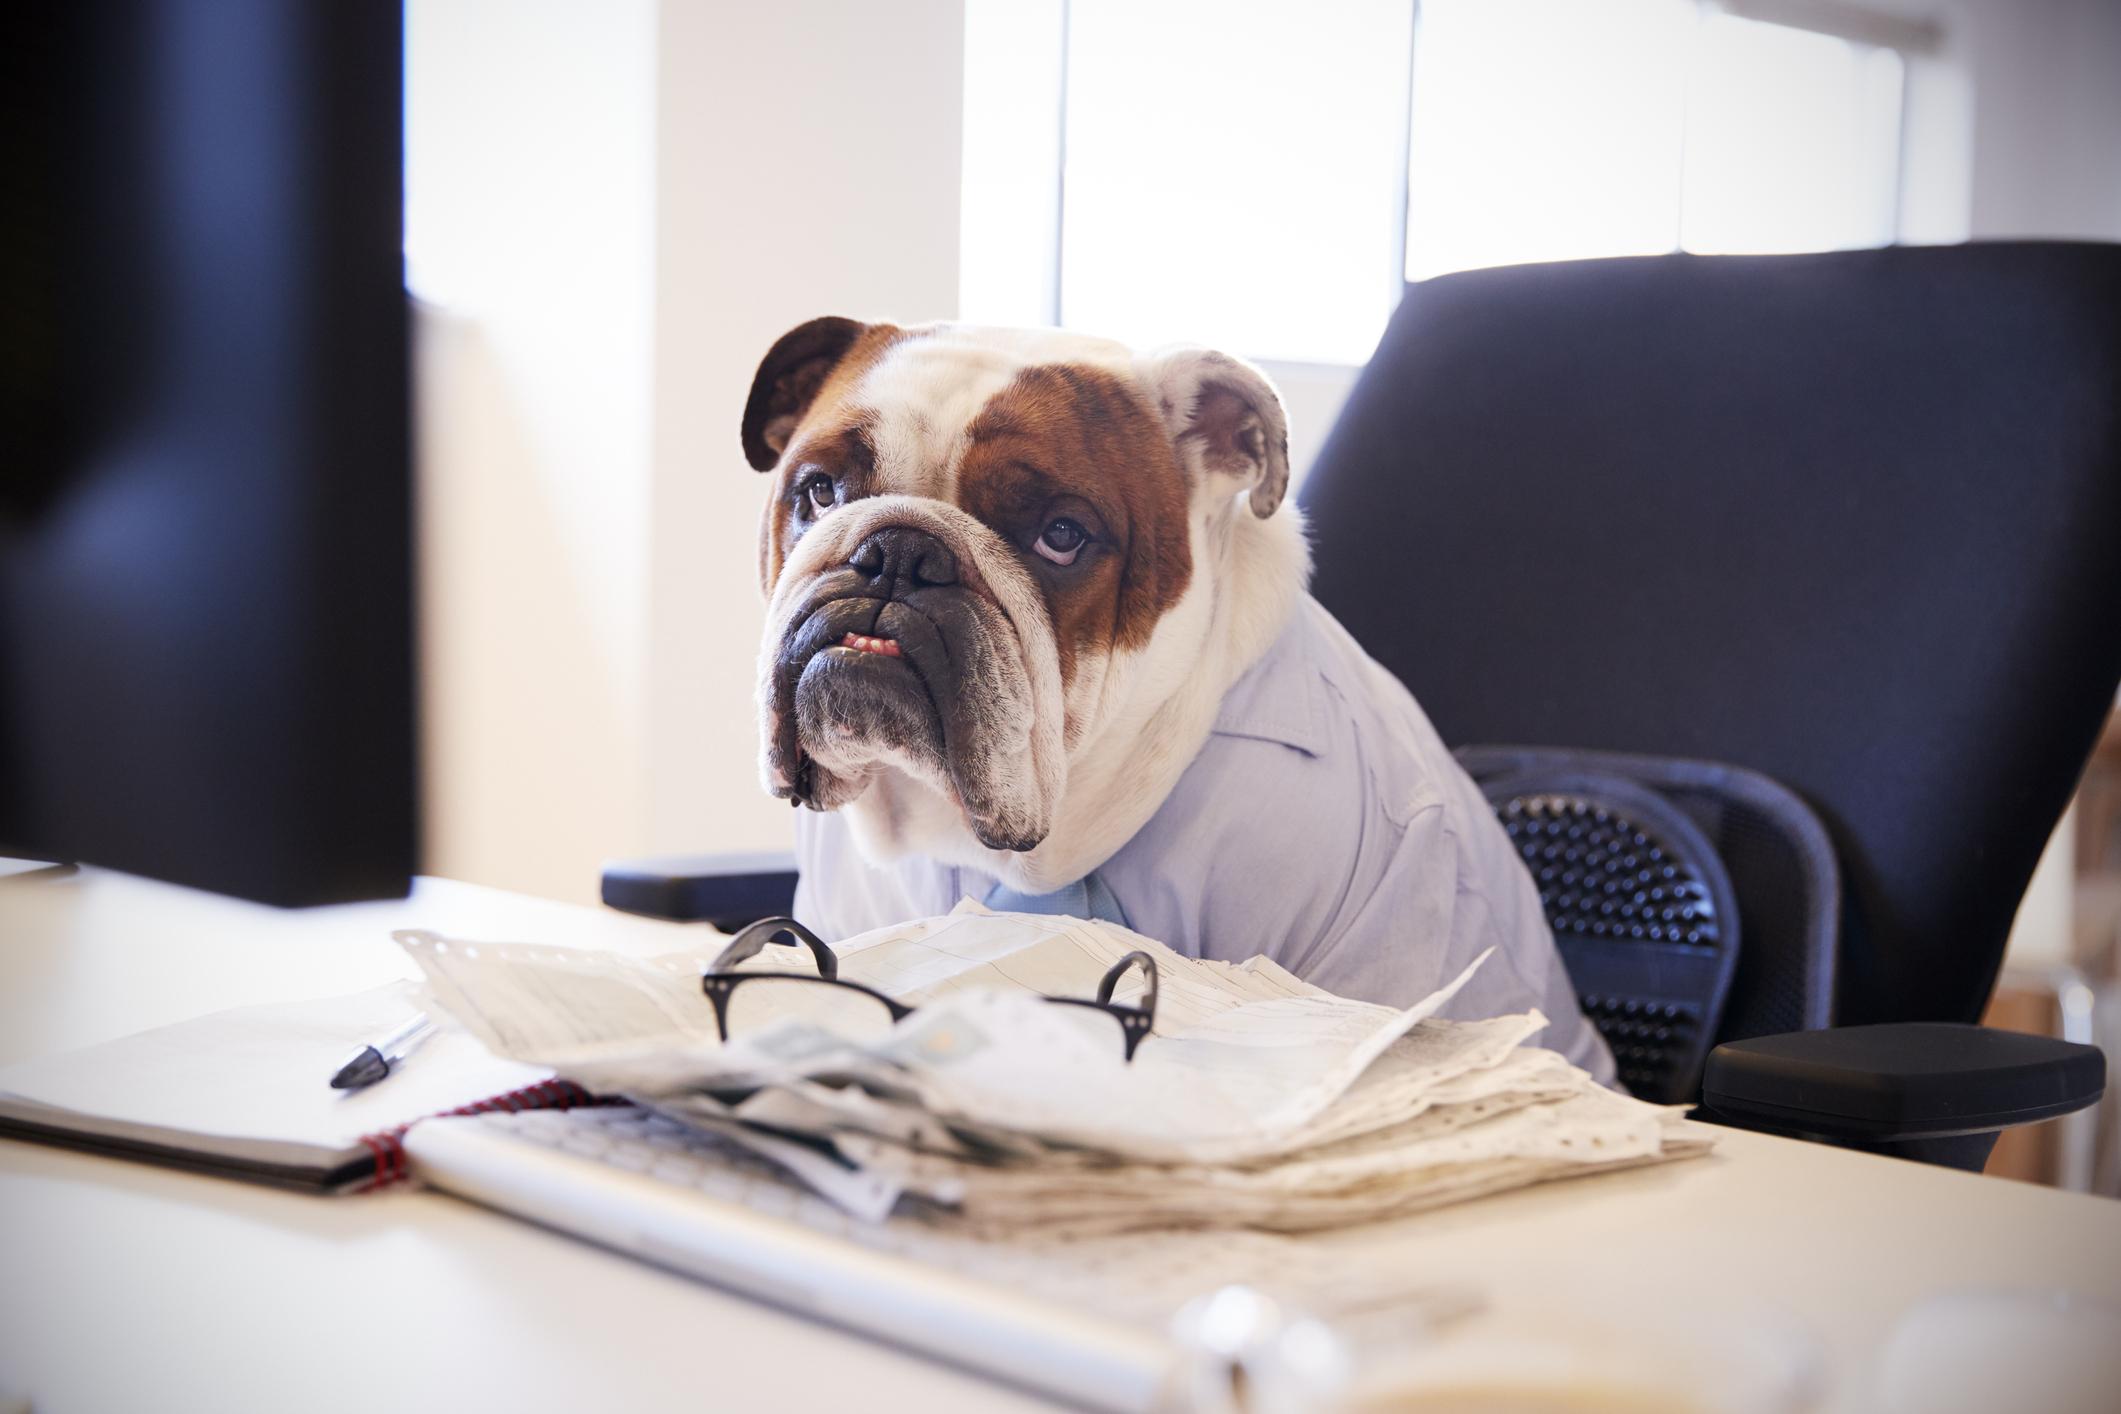 Bulldog Dressed As Businessman Works At Desk On Computer